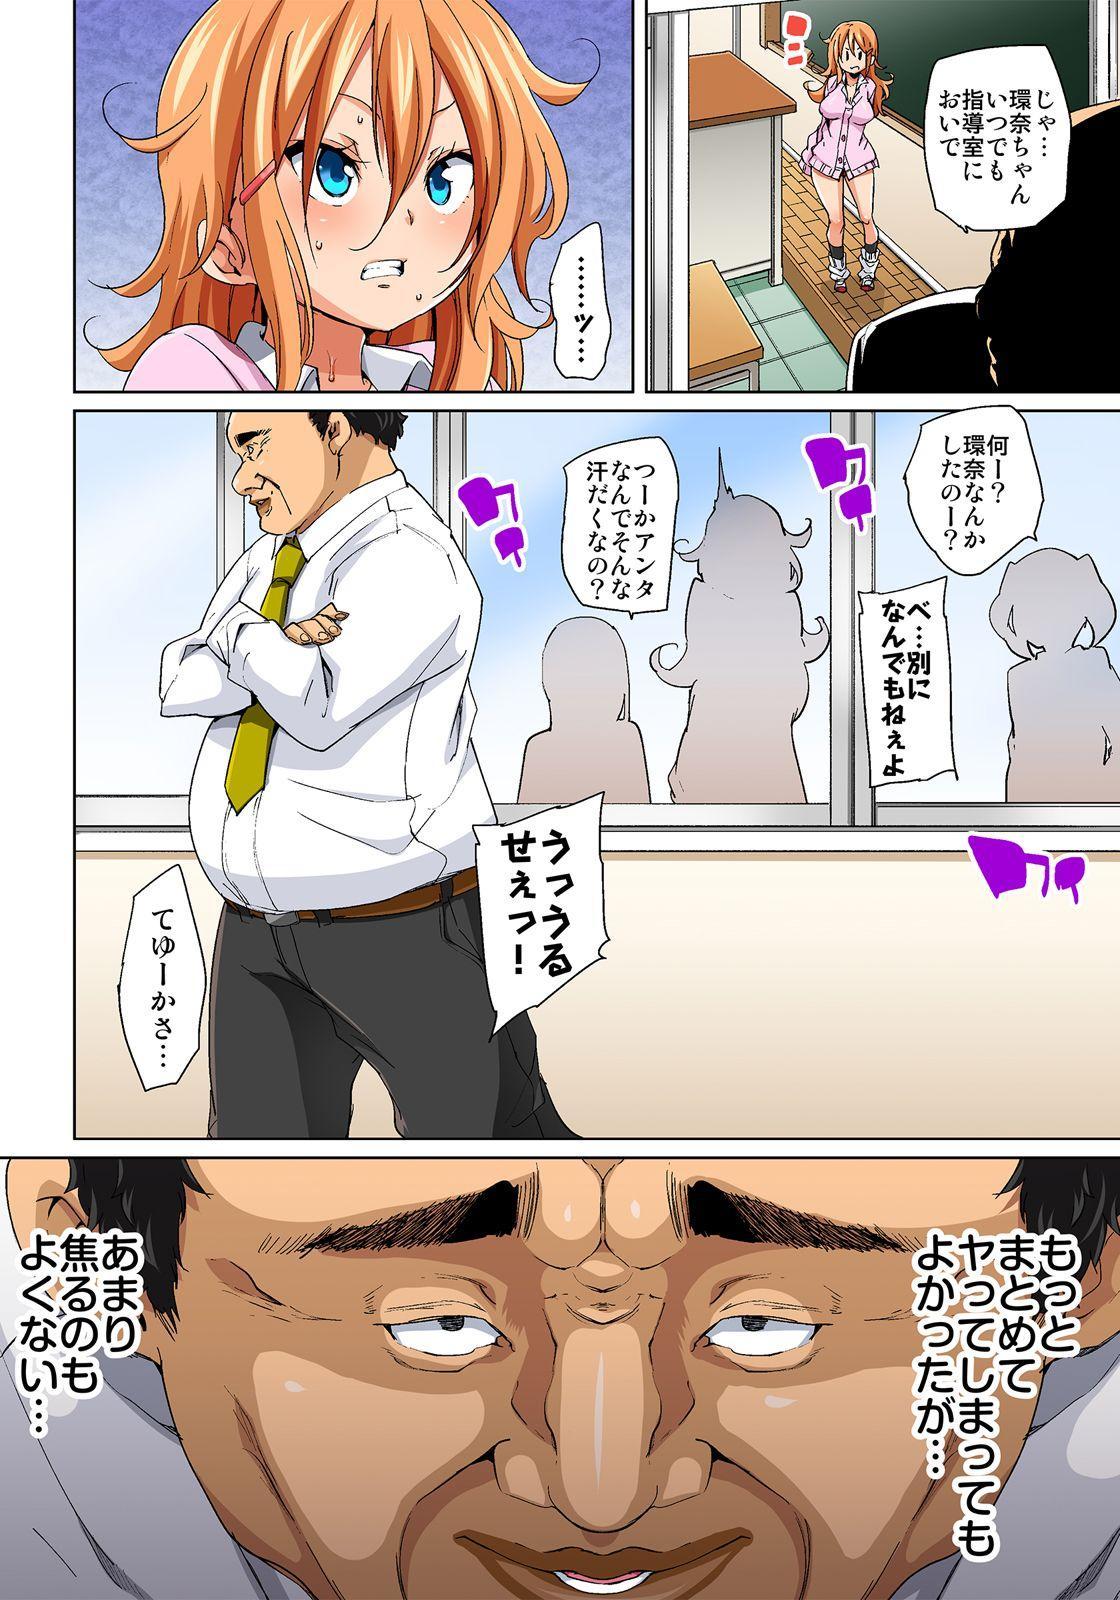 Hattara Yarachau!? Ero Seal Wagamama JK no Asoko o Tatta 1-mai de Dorei ni 6 29